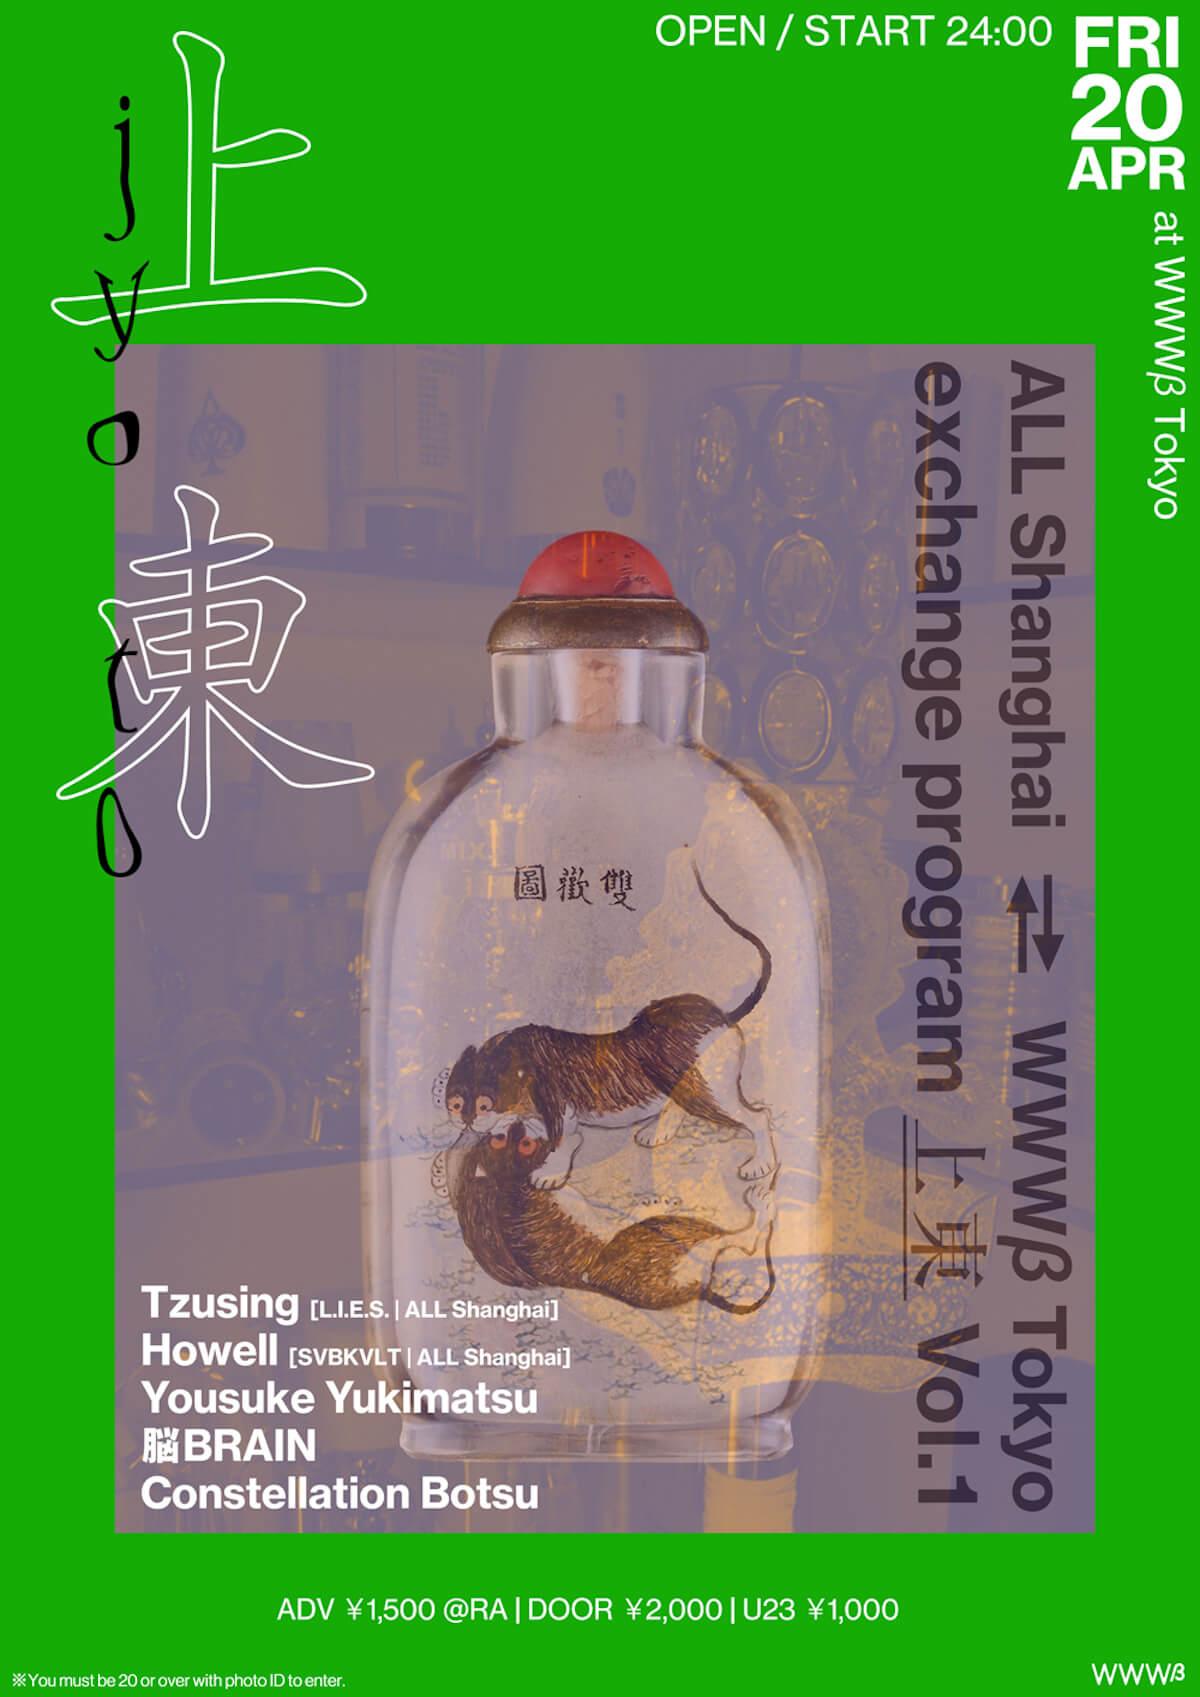 ALL×WWWβ、交換プログラム<上東(ジョウトウ)>がスタート!東京編にはTzusing、上海編にはD.J.Fulltonoらが出演 music180323_jyoto_kawasaki_04